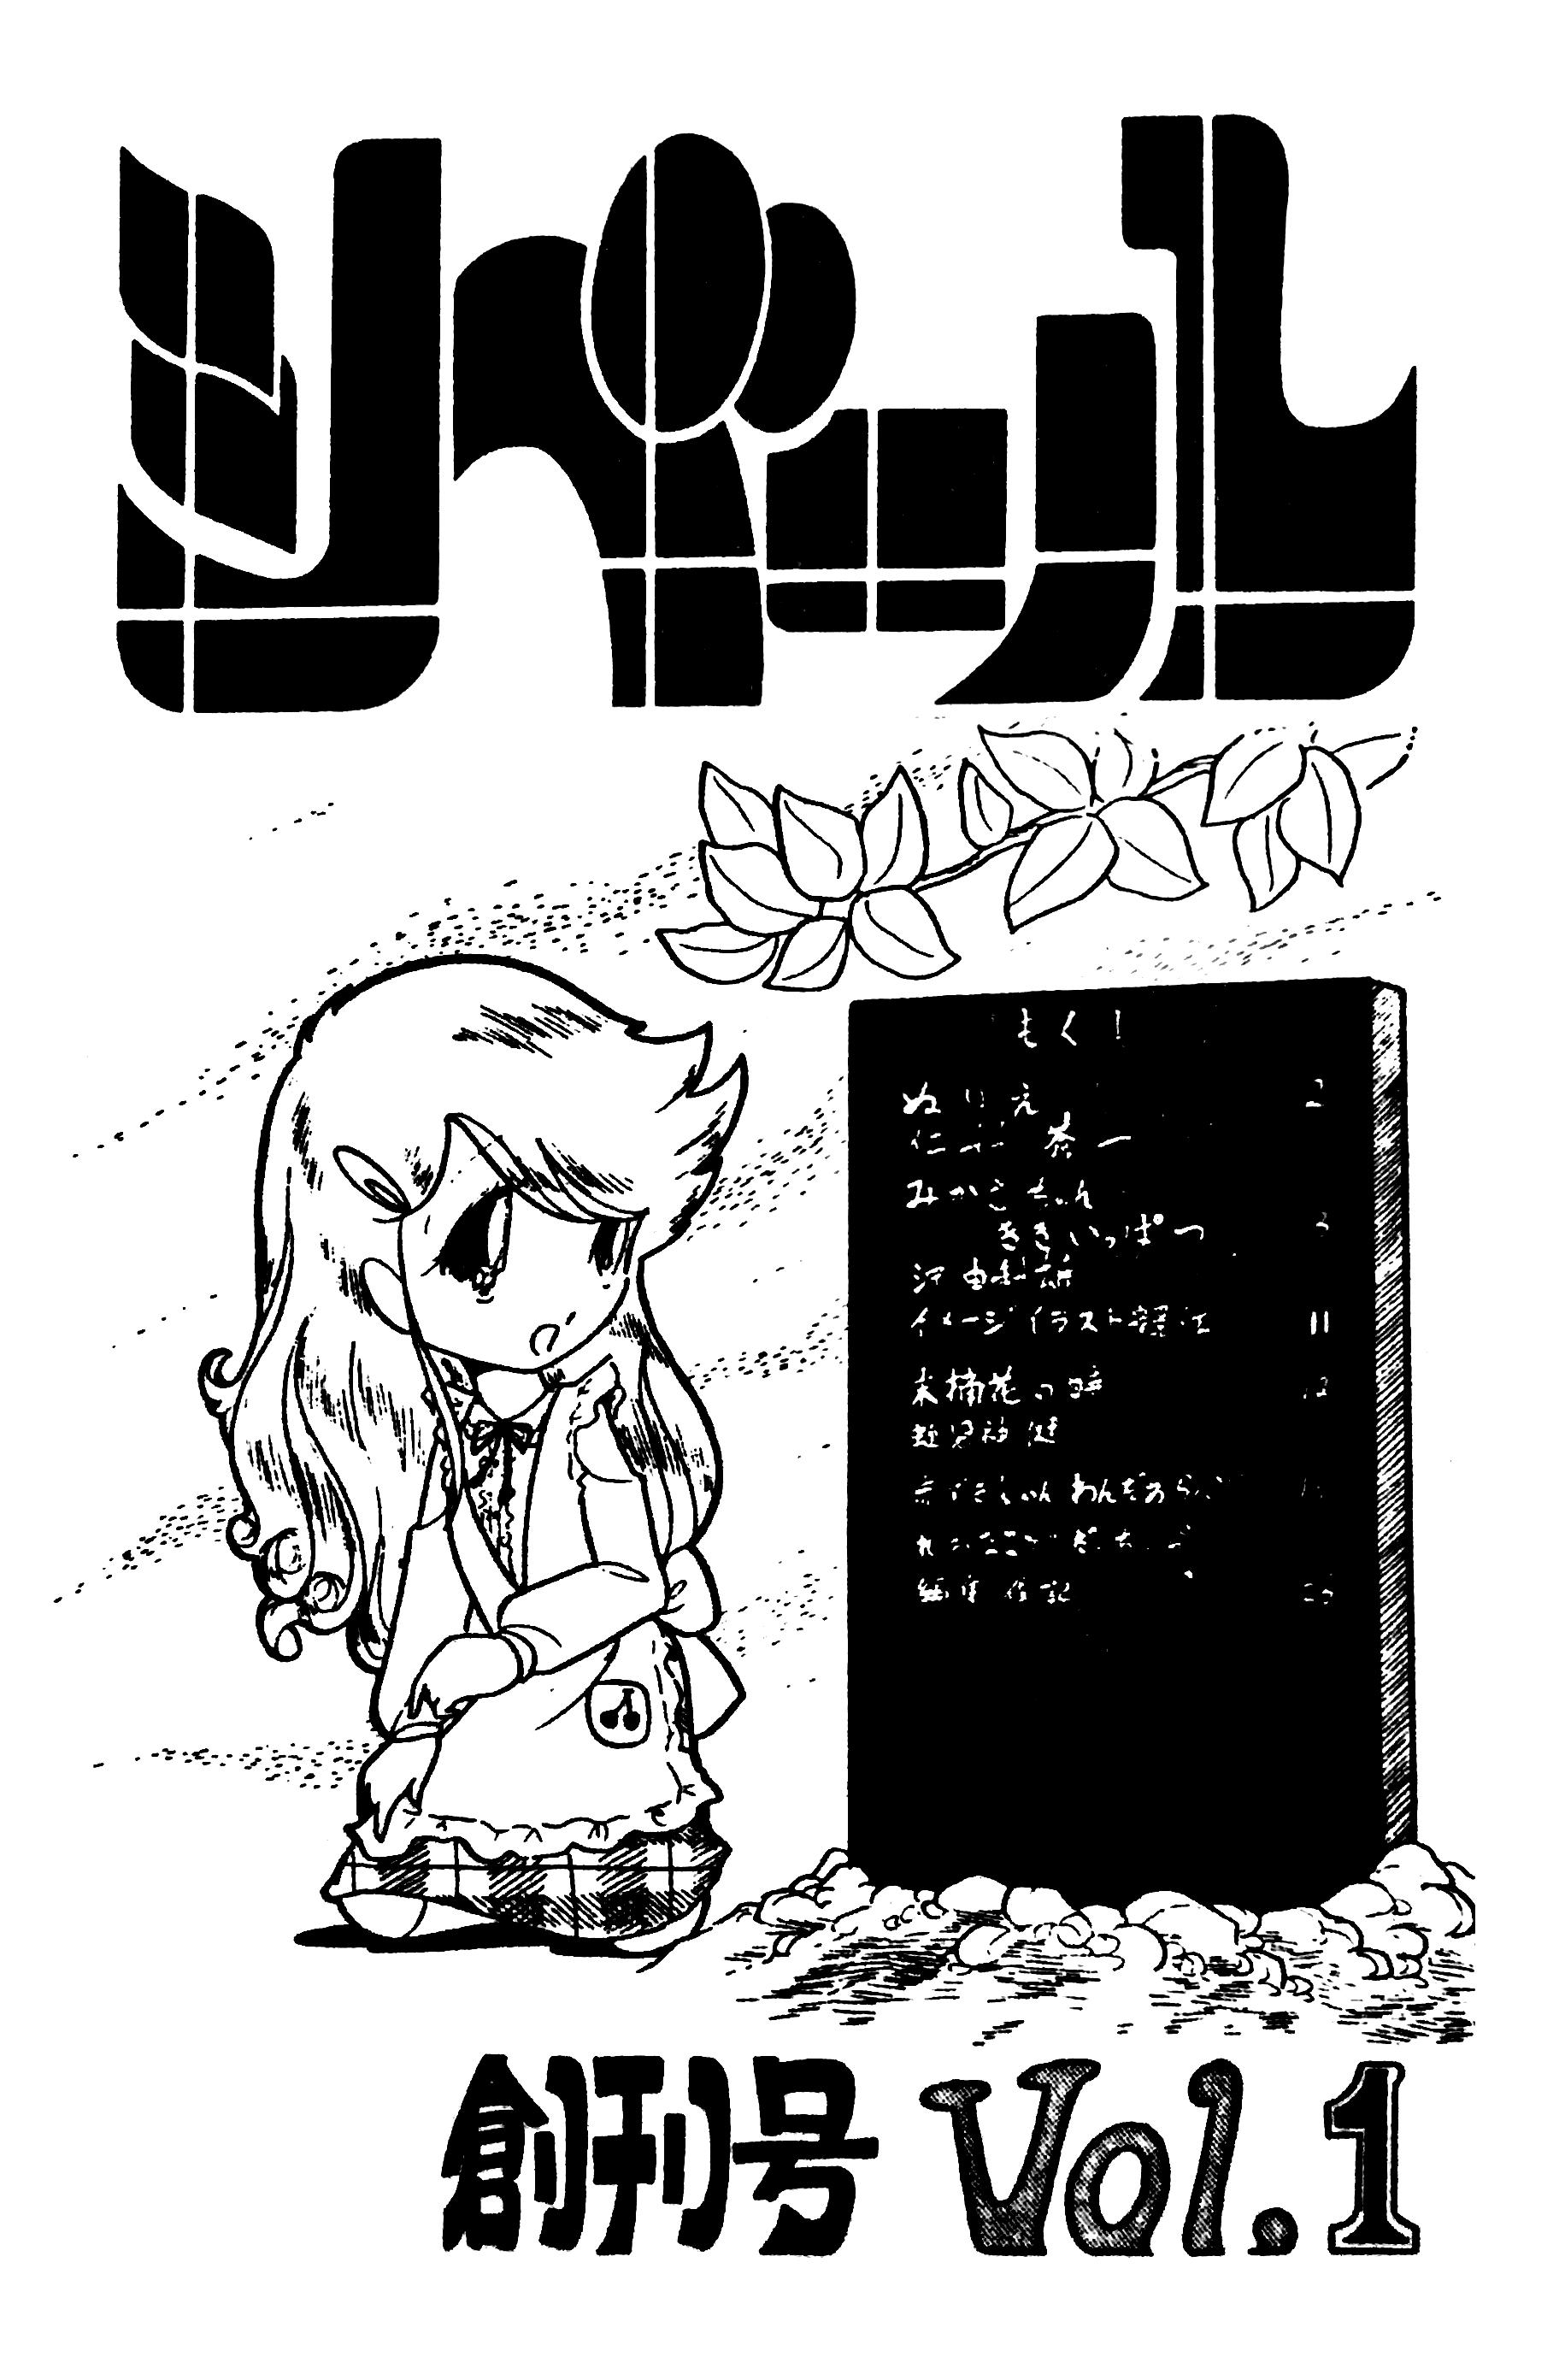 f:id:kougasetumei:20191014173309p:image:w400